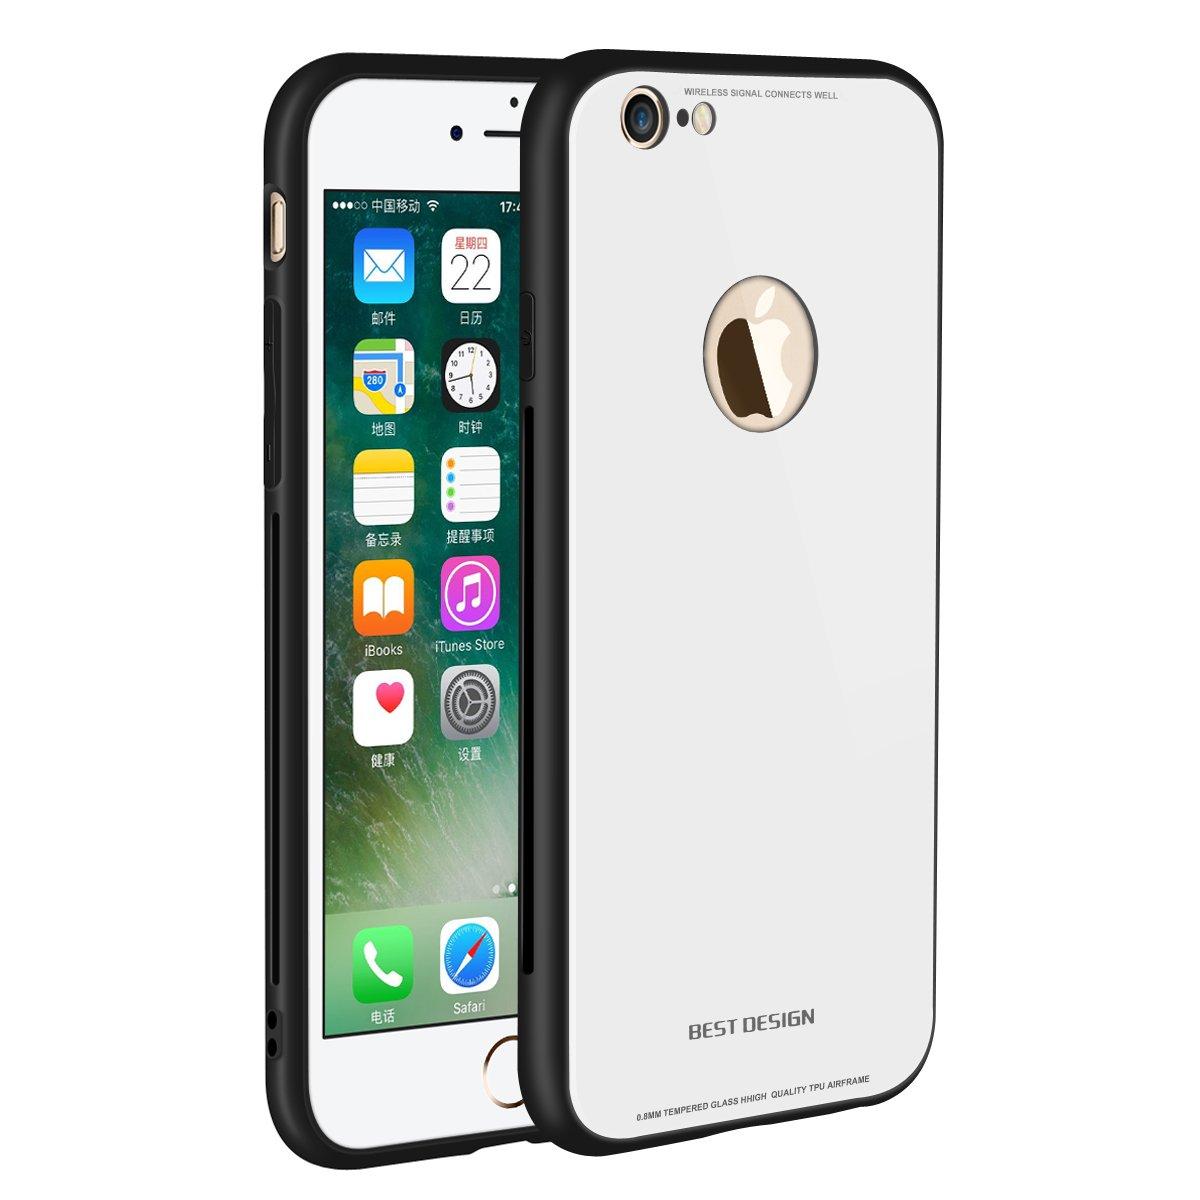 iPhone 6 Plus / 6s Plusケース、iCoverCaseアンチスクラッチテンペレッドガラスバックカバー+アンチドロップ&スリップ防止TPUフレームハイブリッドシェルスリムケース耐衝撃カバーケースiPhone 6 Plus / 6s Plus 5.5用 - ホワイト   B07BPT2NNP